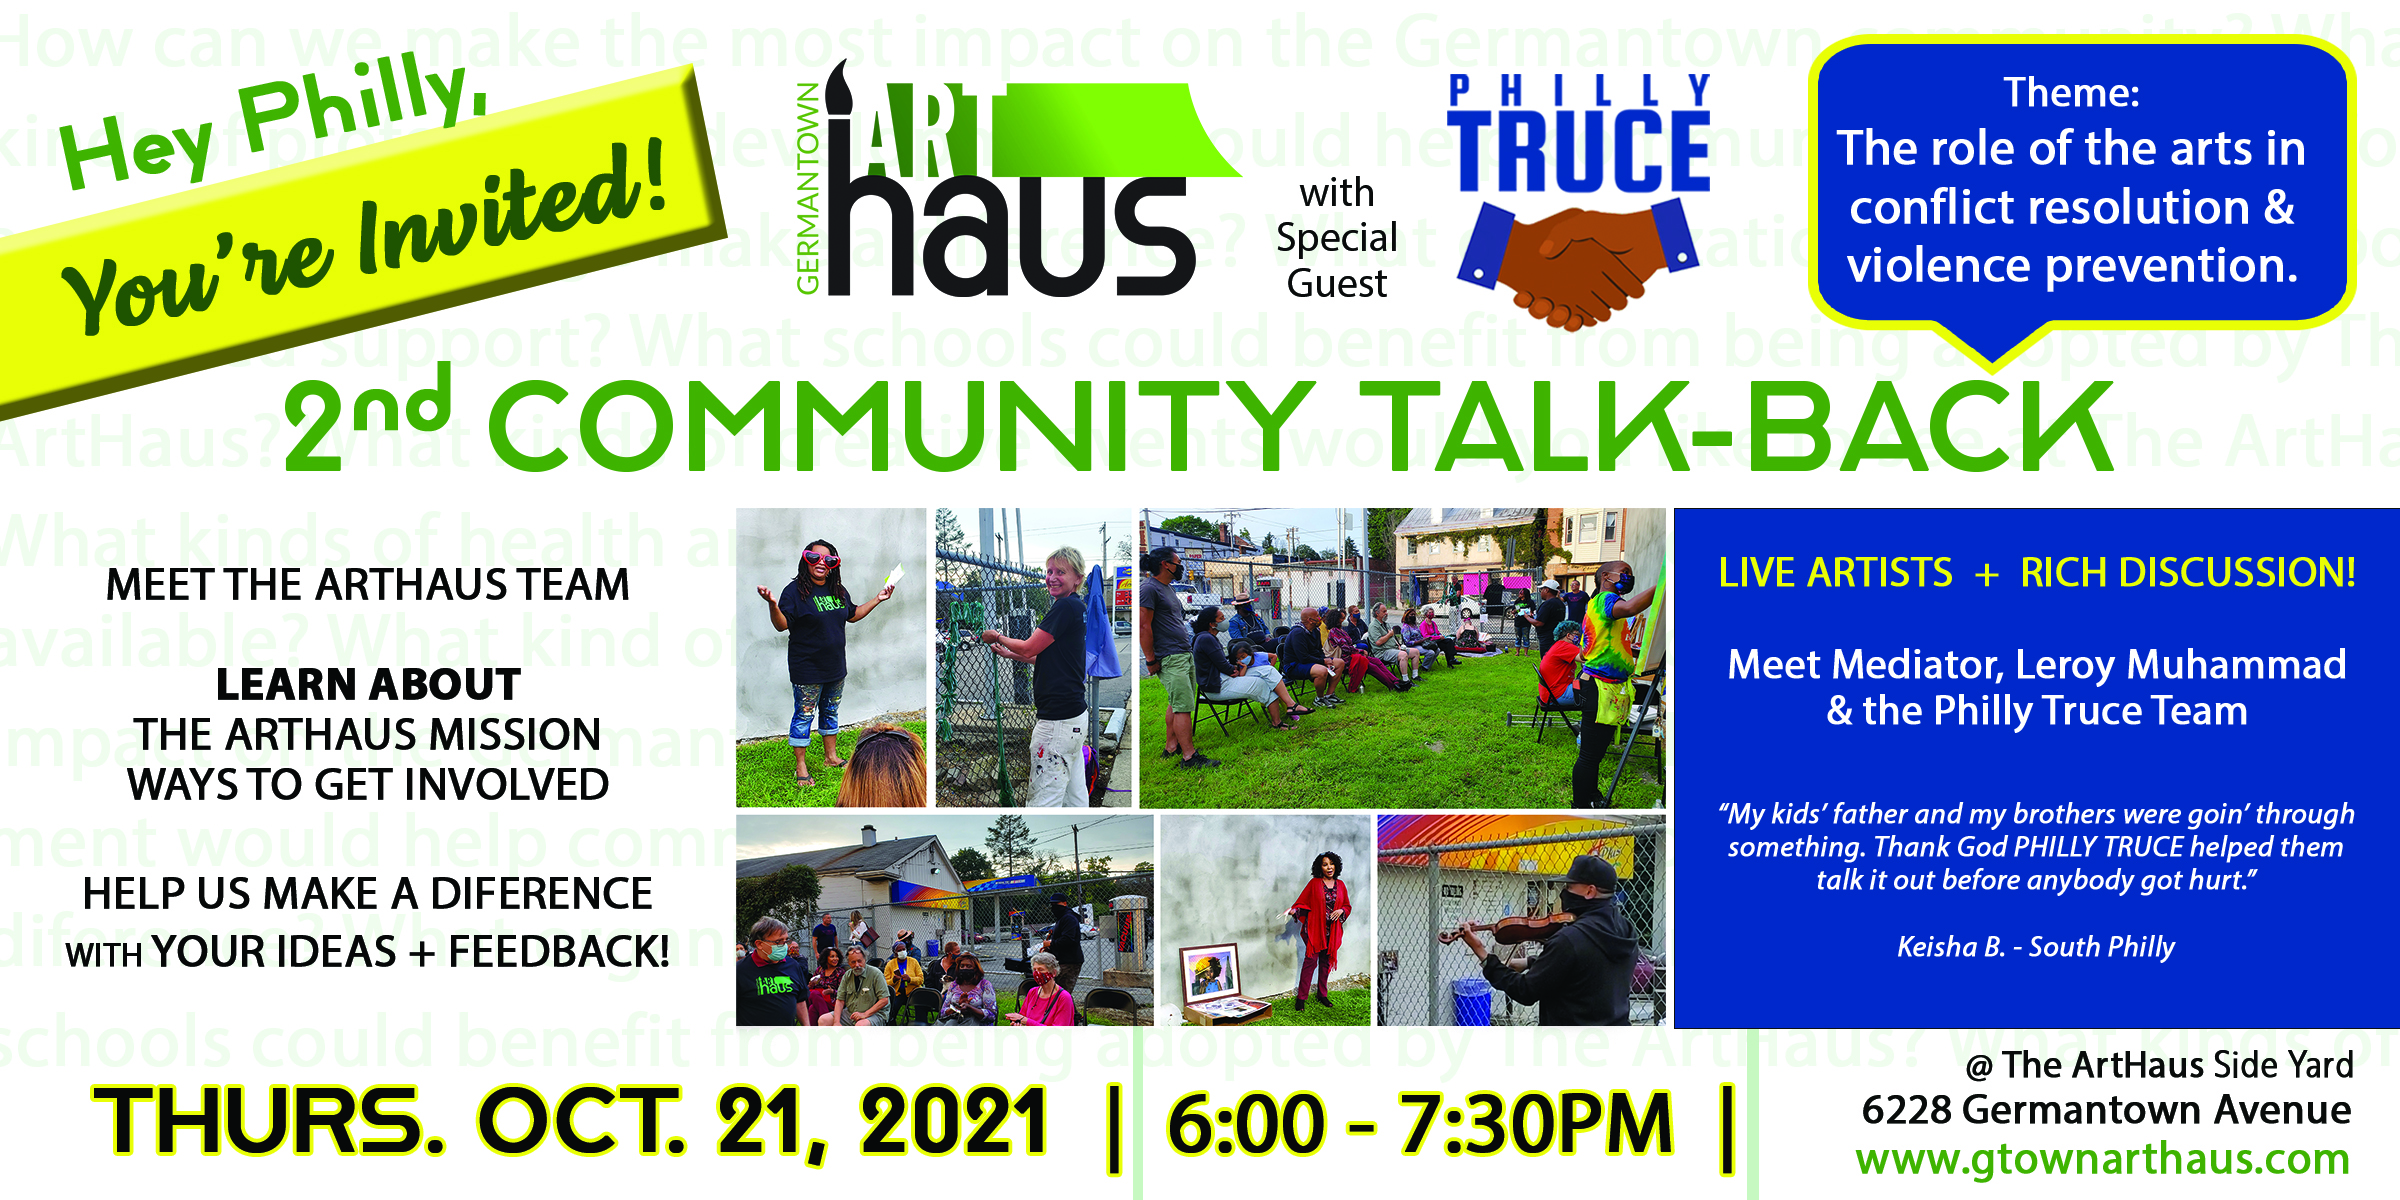 ArtHaus Comm Talk-Back w Philly Truce 10-21-21